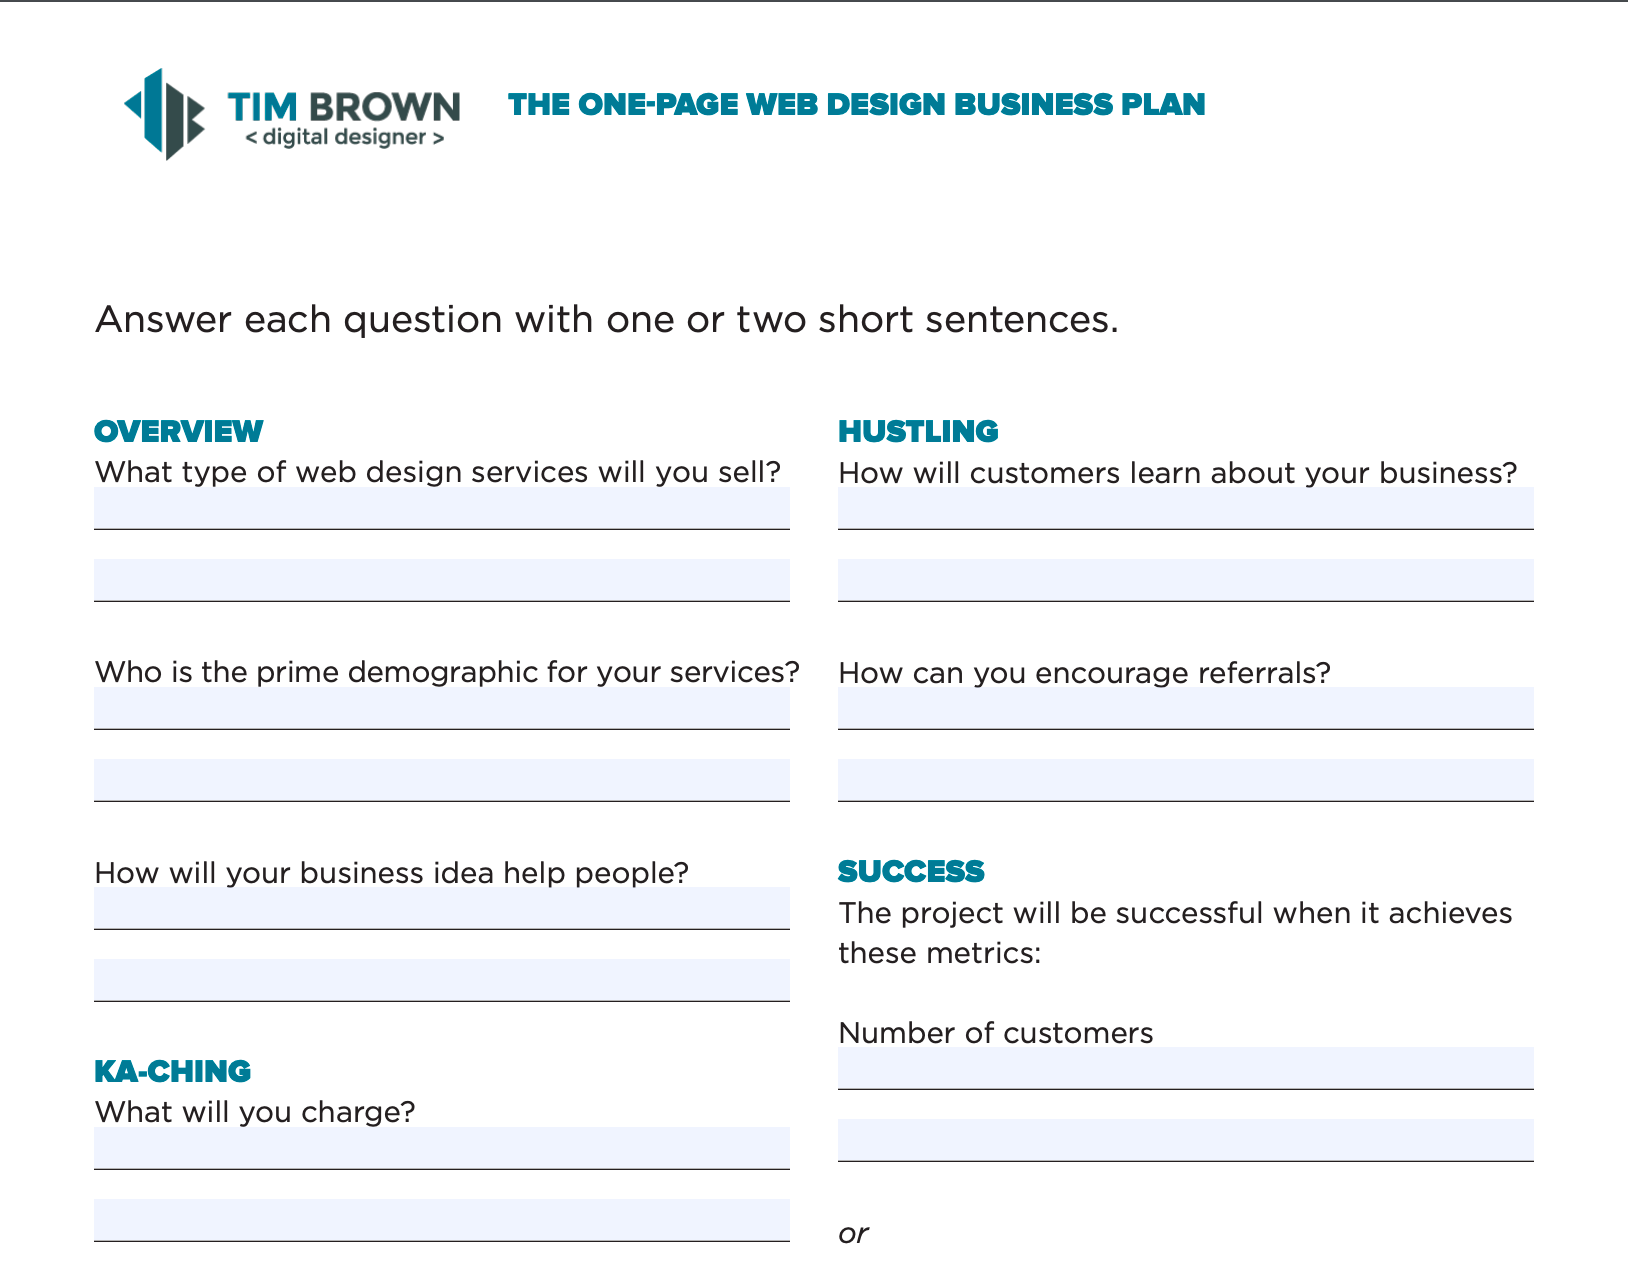 one-page-web-design-business-plan-pdf